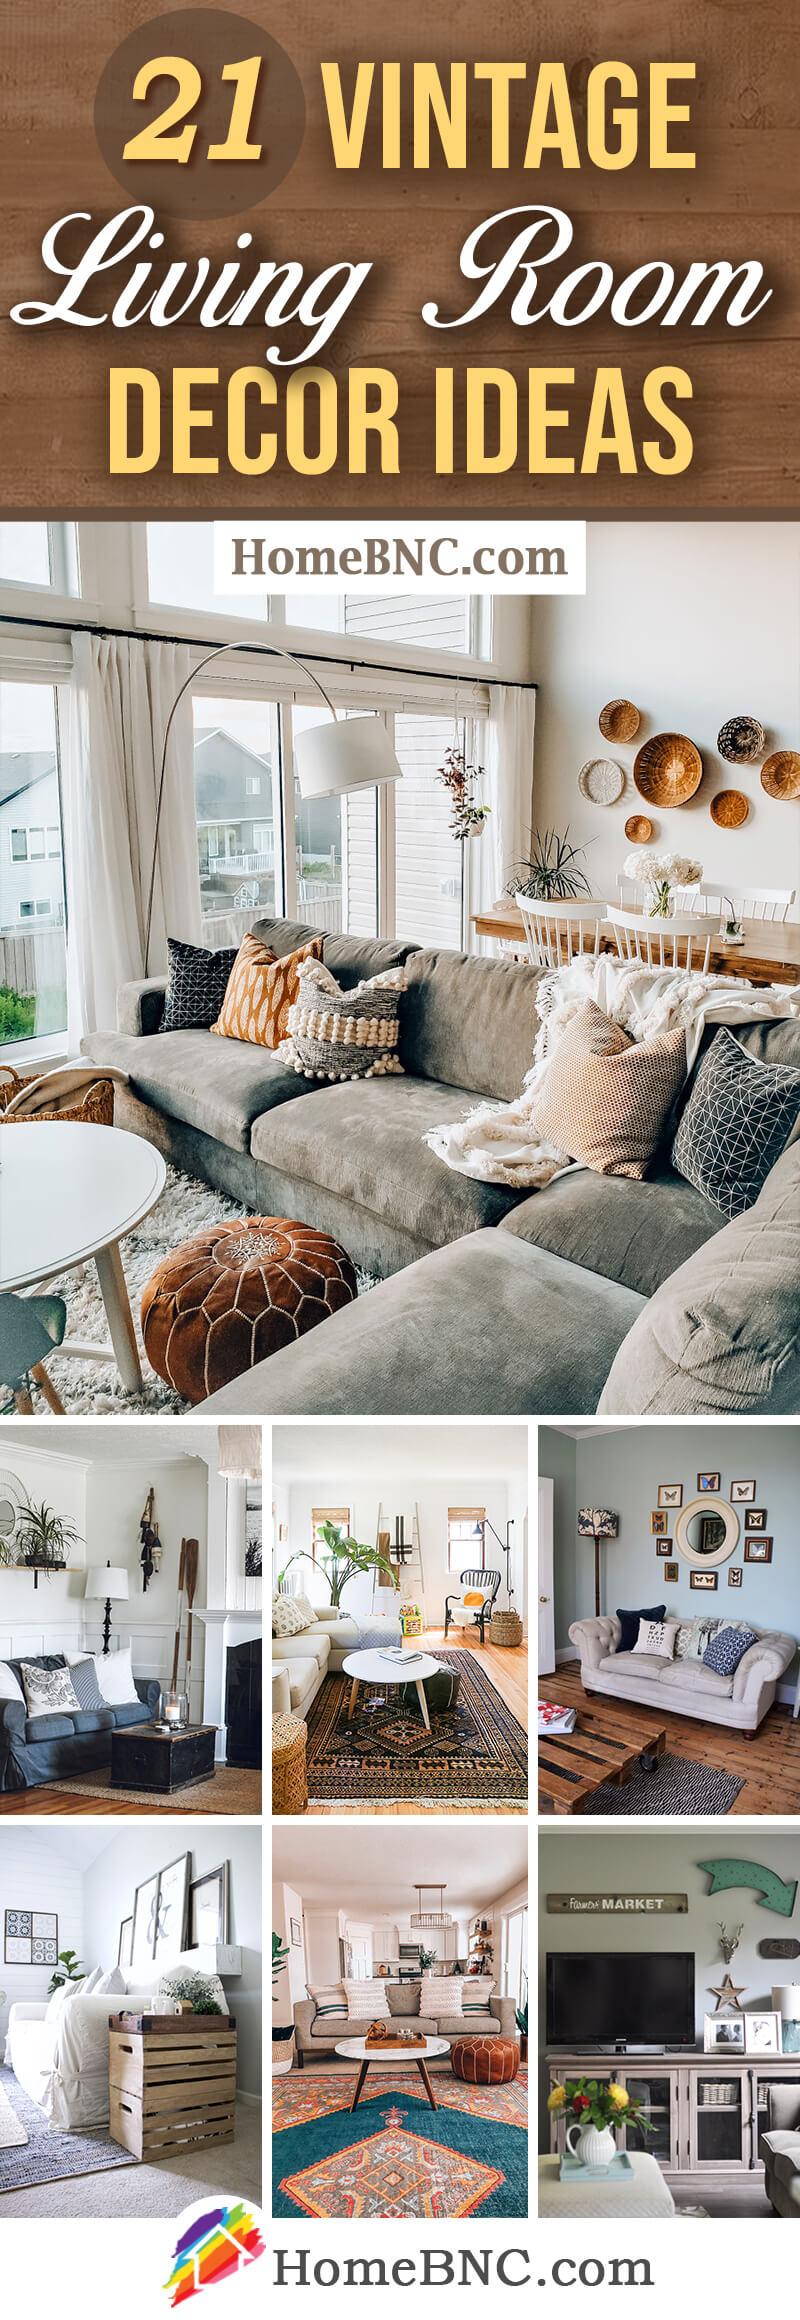 Best Vintage Living Room Decor and Design Ideas